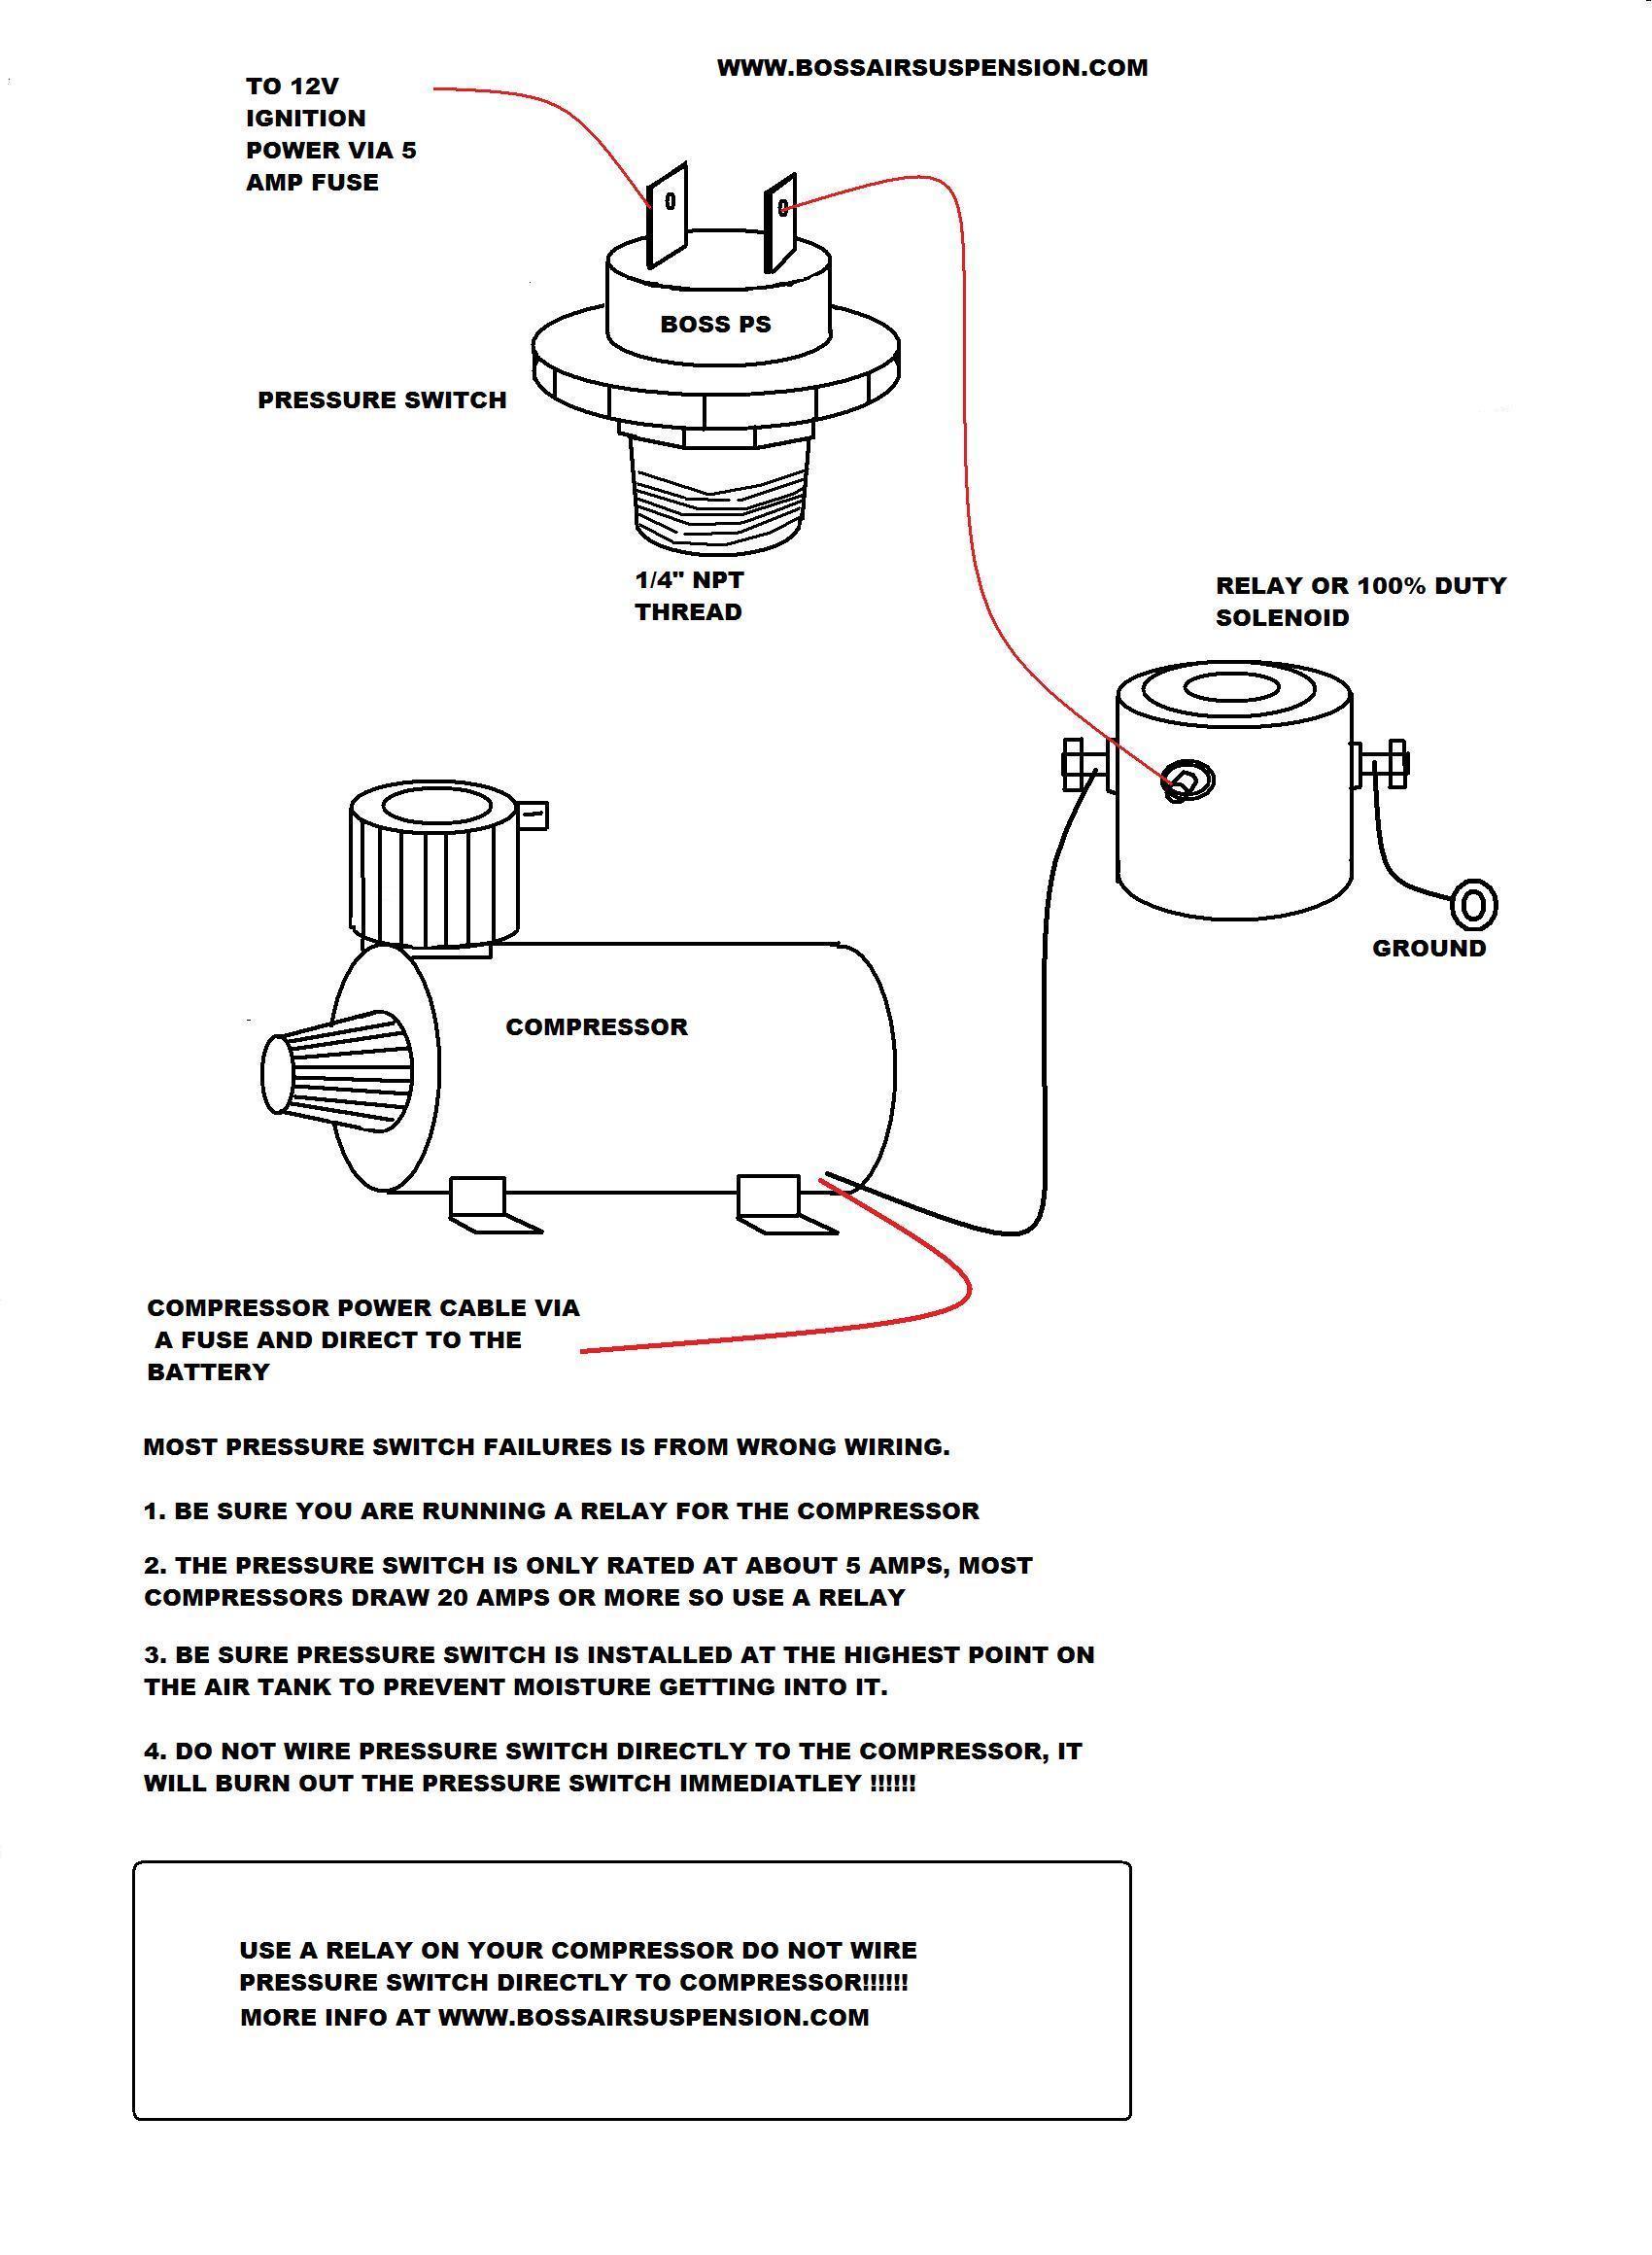 Pressure Switch Diagram Good Guide Of Wiring Pump On Water Well Diagrams Rh 8 3 Jennifer Retzke De Air